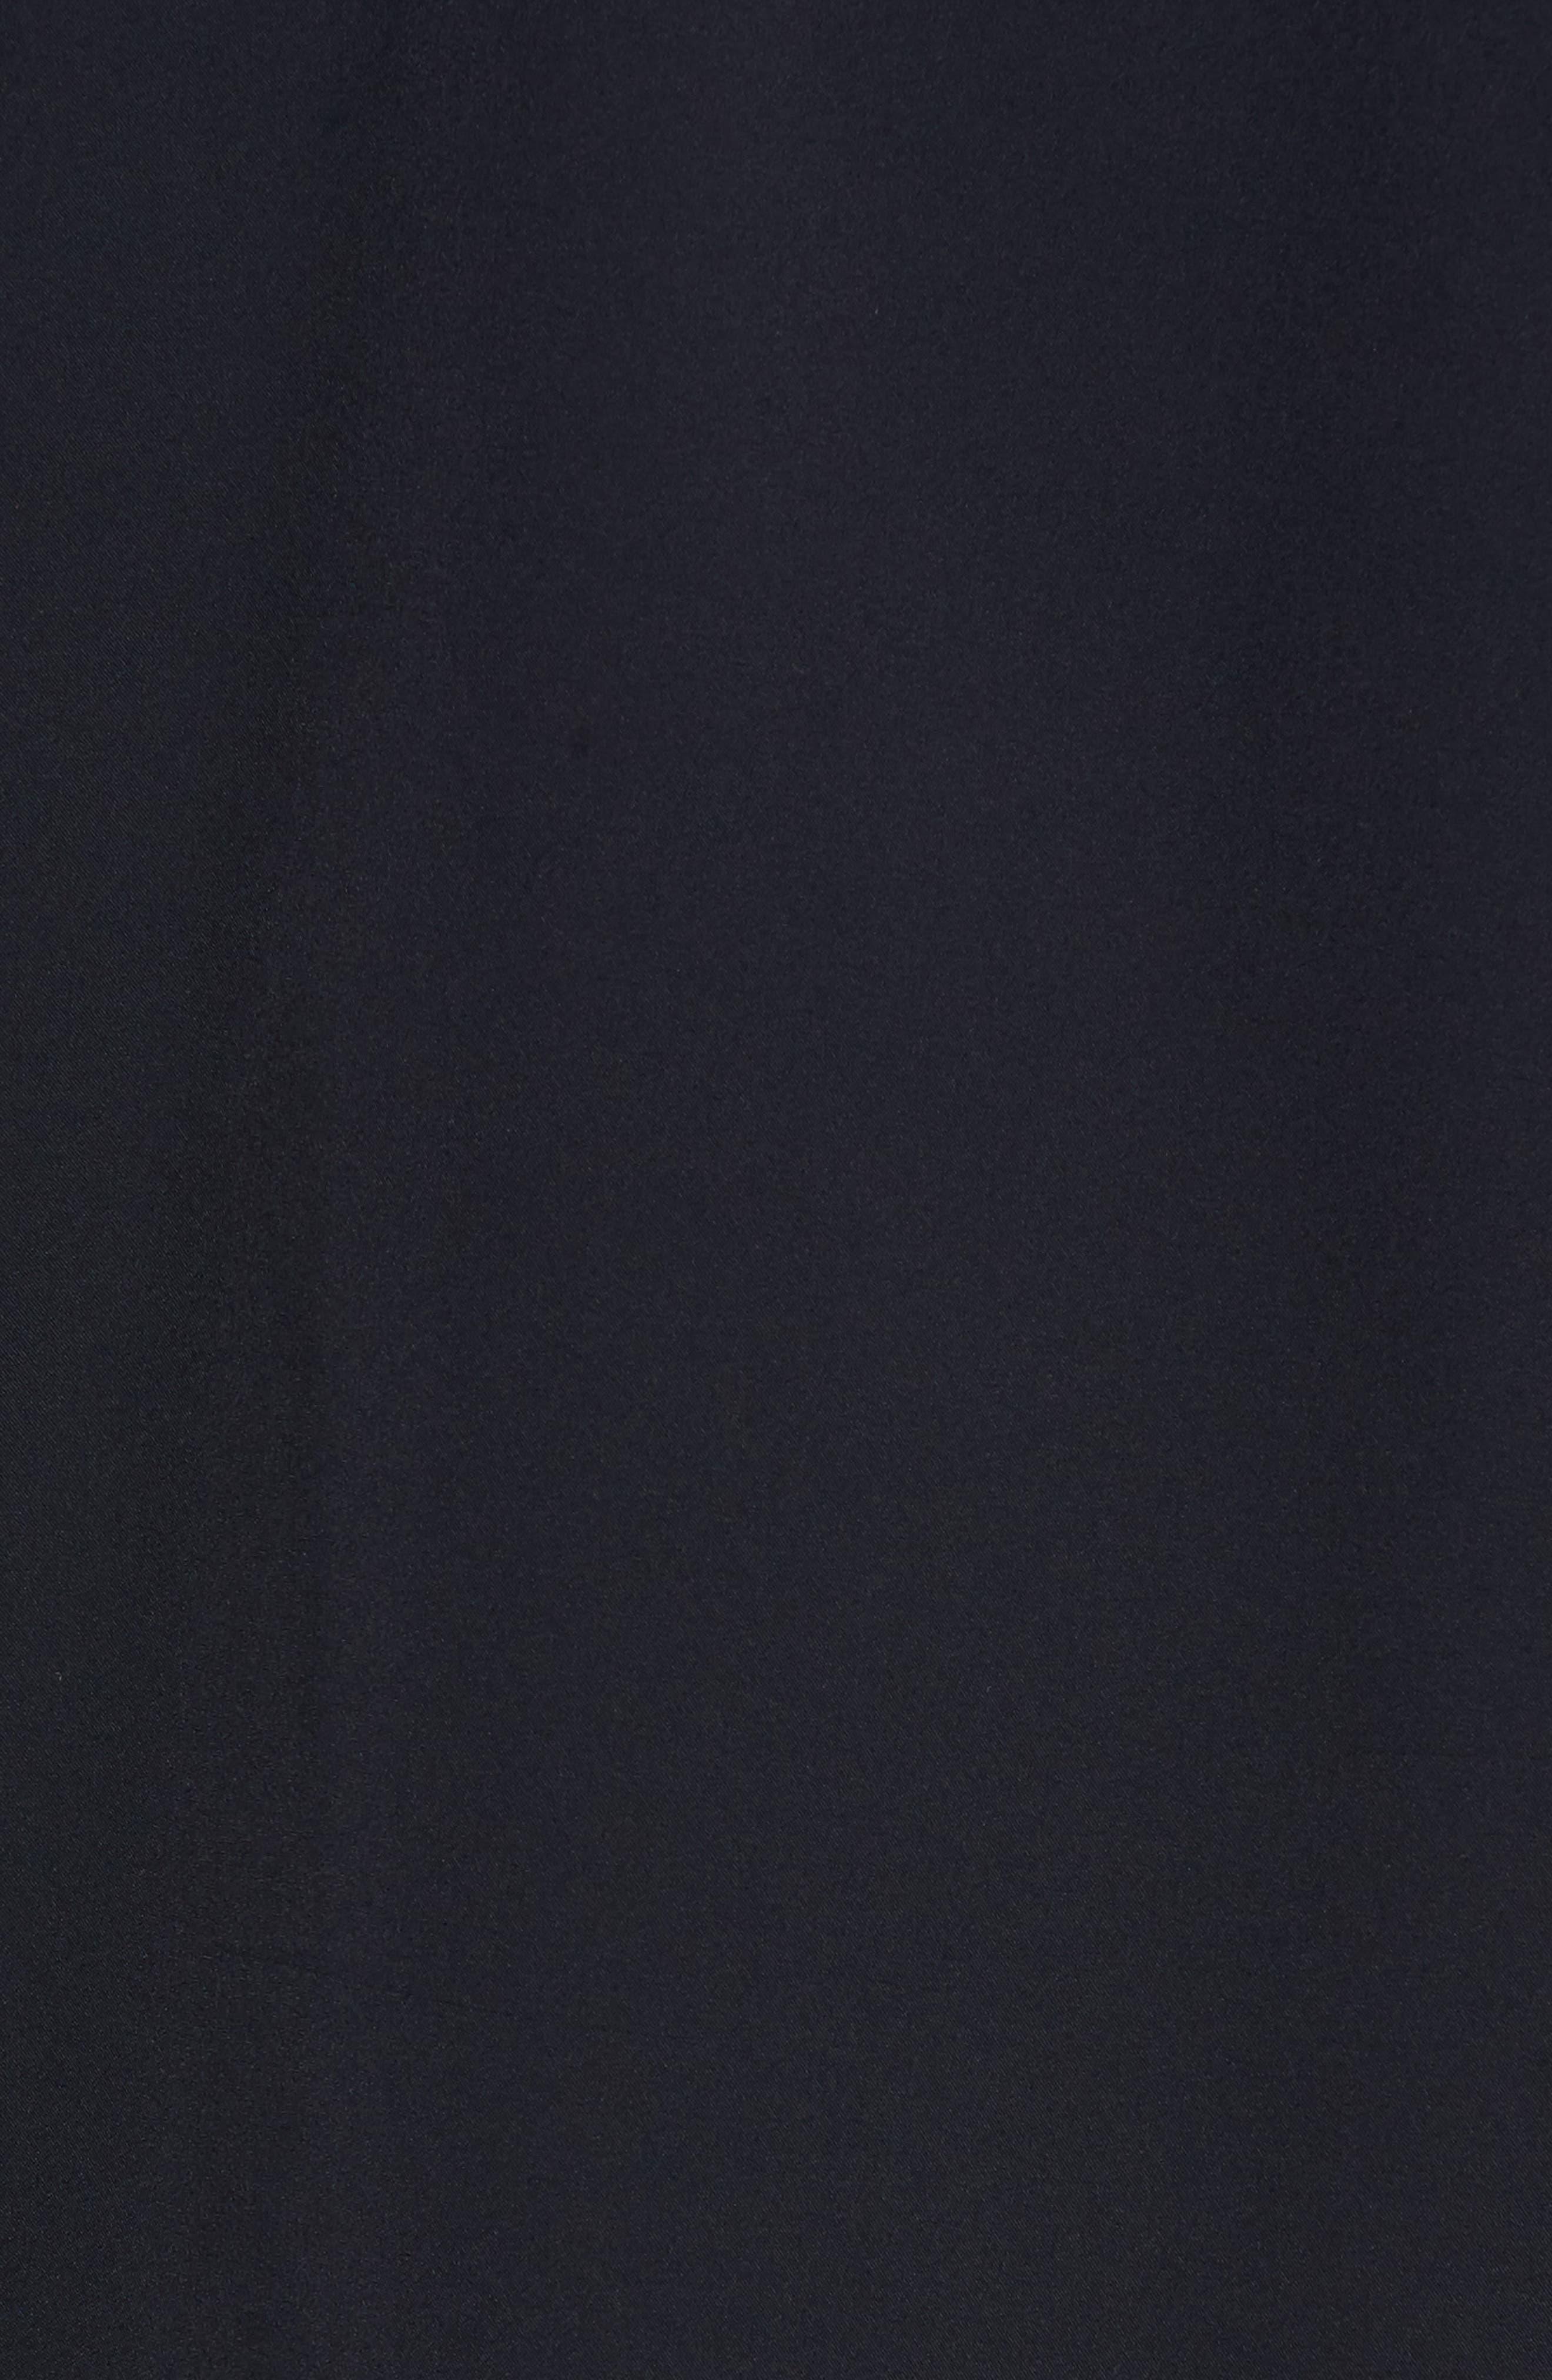 Scotty Bevan Zip Front Jacket,                             Alternate thumbnail 6, color,                             Eclipse